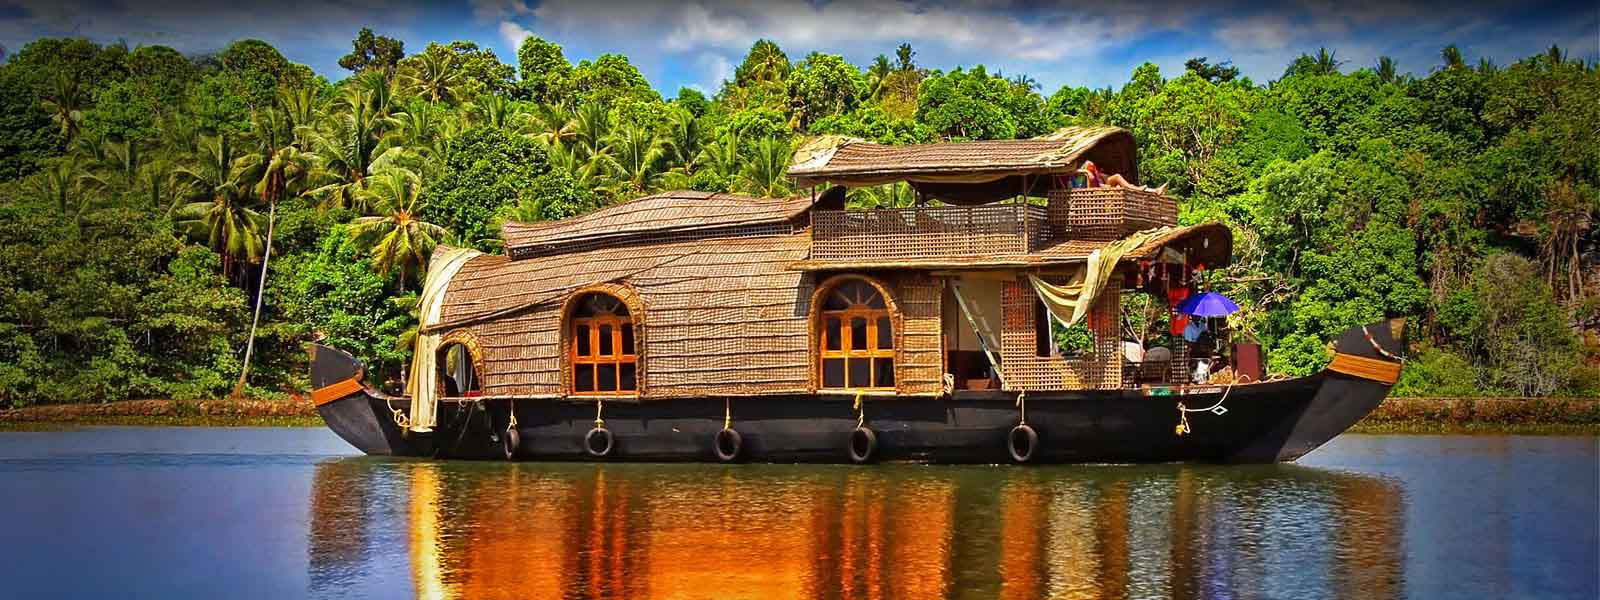 Houseboat Images Alleppey Houseboats Booking Kerala Houseboats Booking